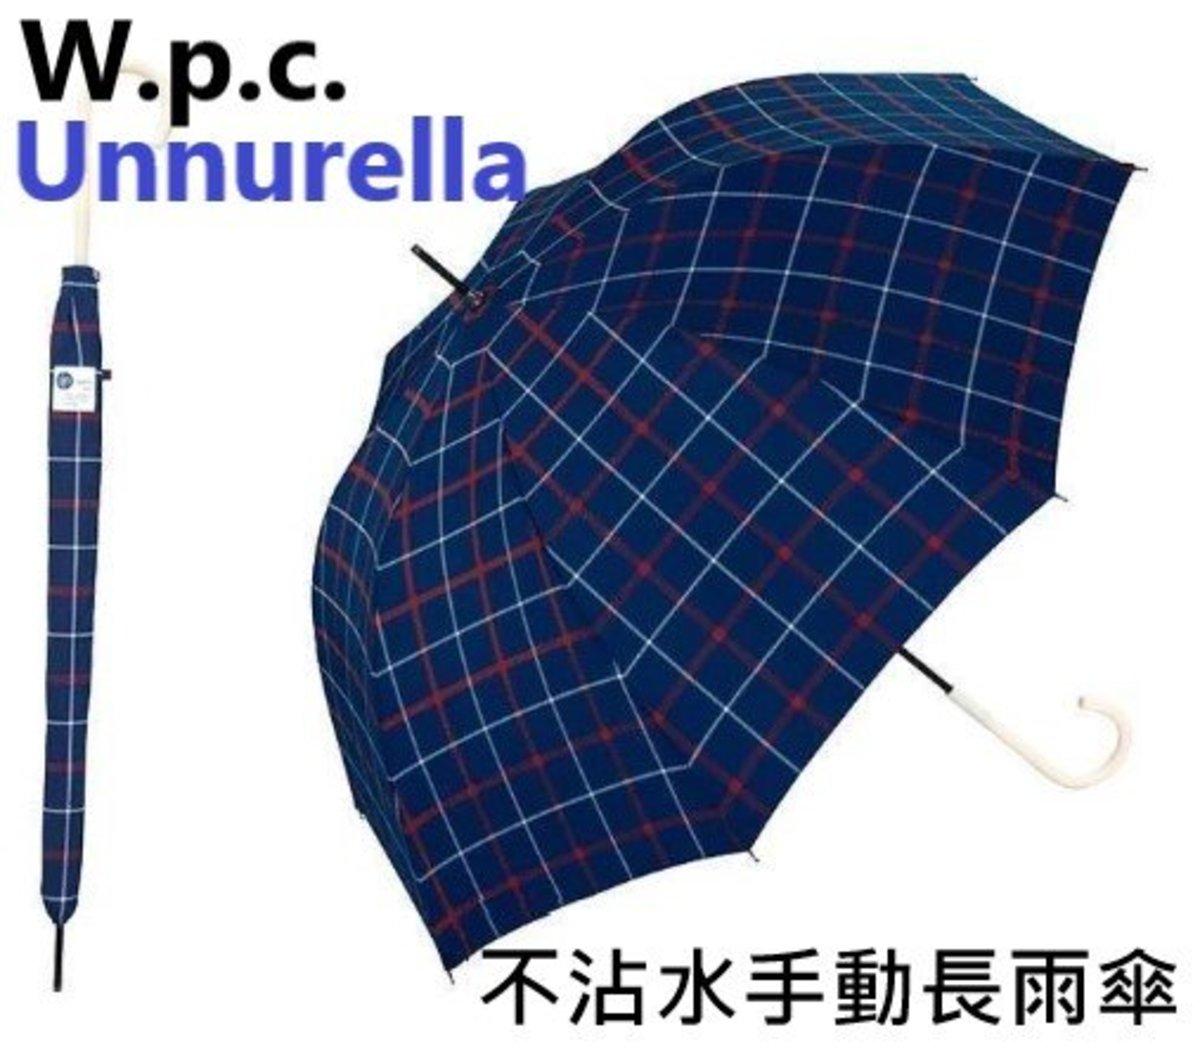 (UN1006) Unnurella Long water resistance umbrella - Trad Check